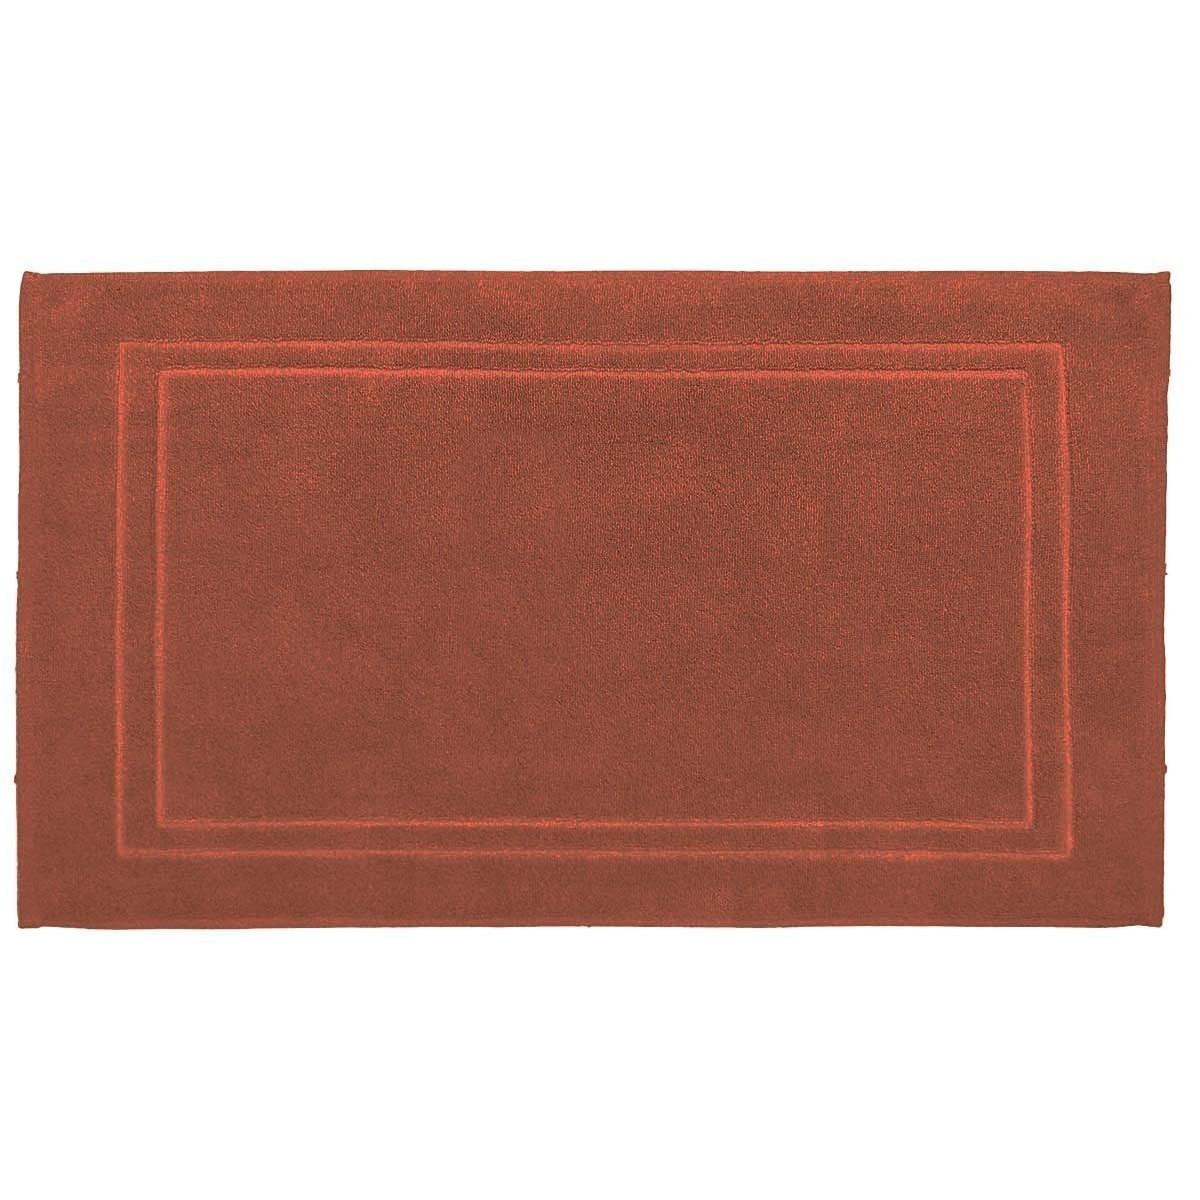 LUXURY - Tapis de bain 900gr/m²  Terracota 50x80 cm